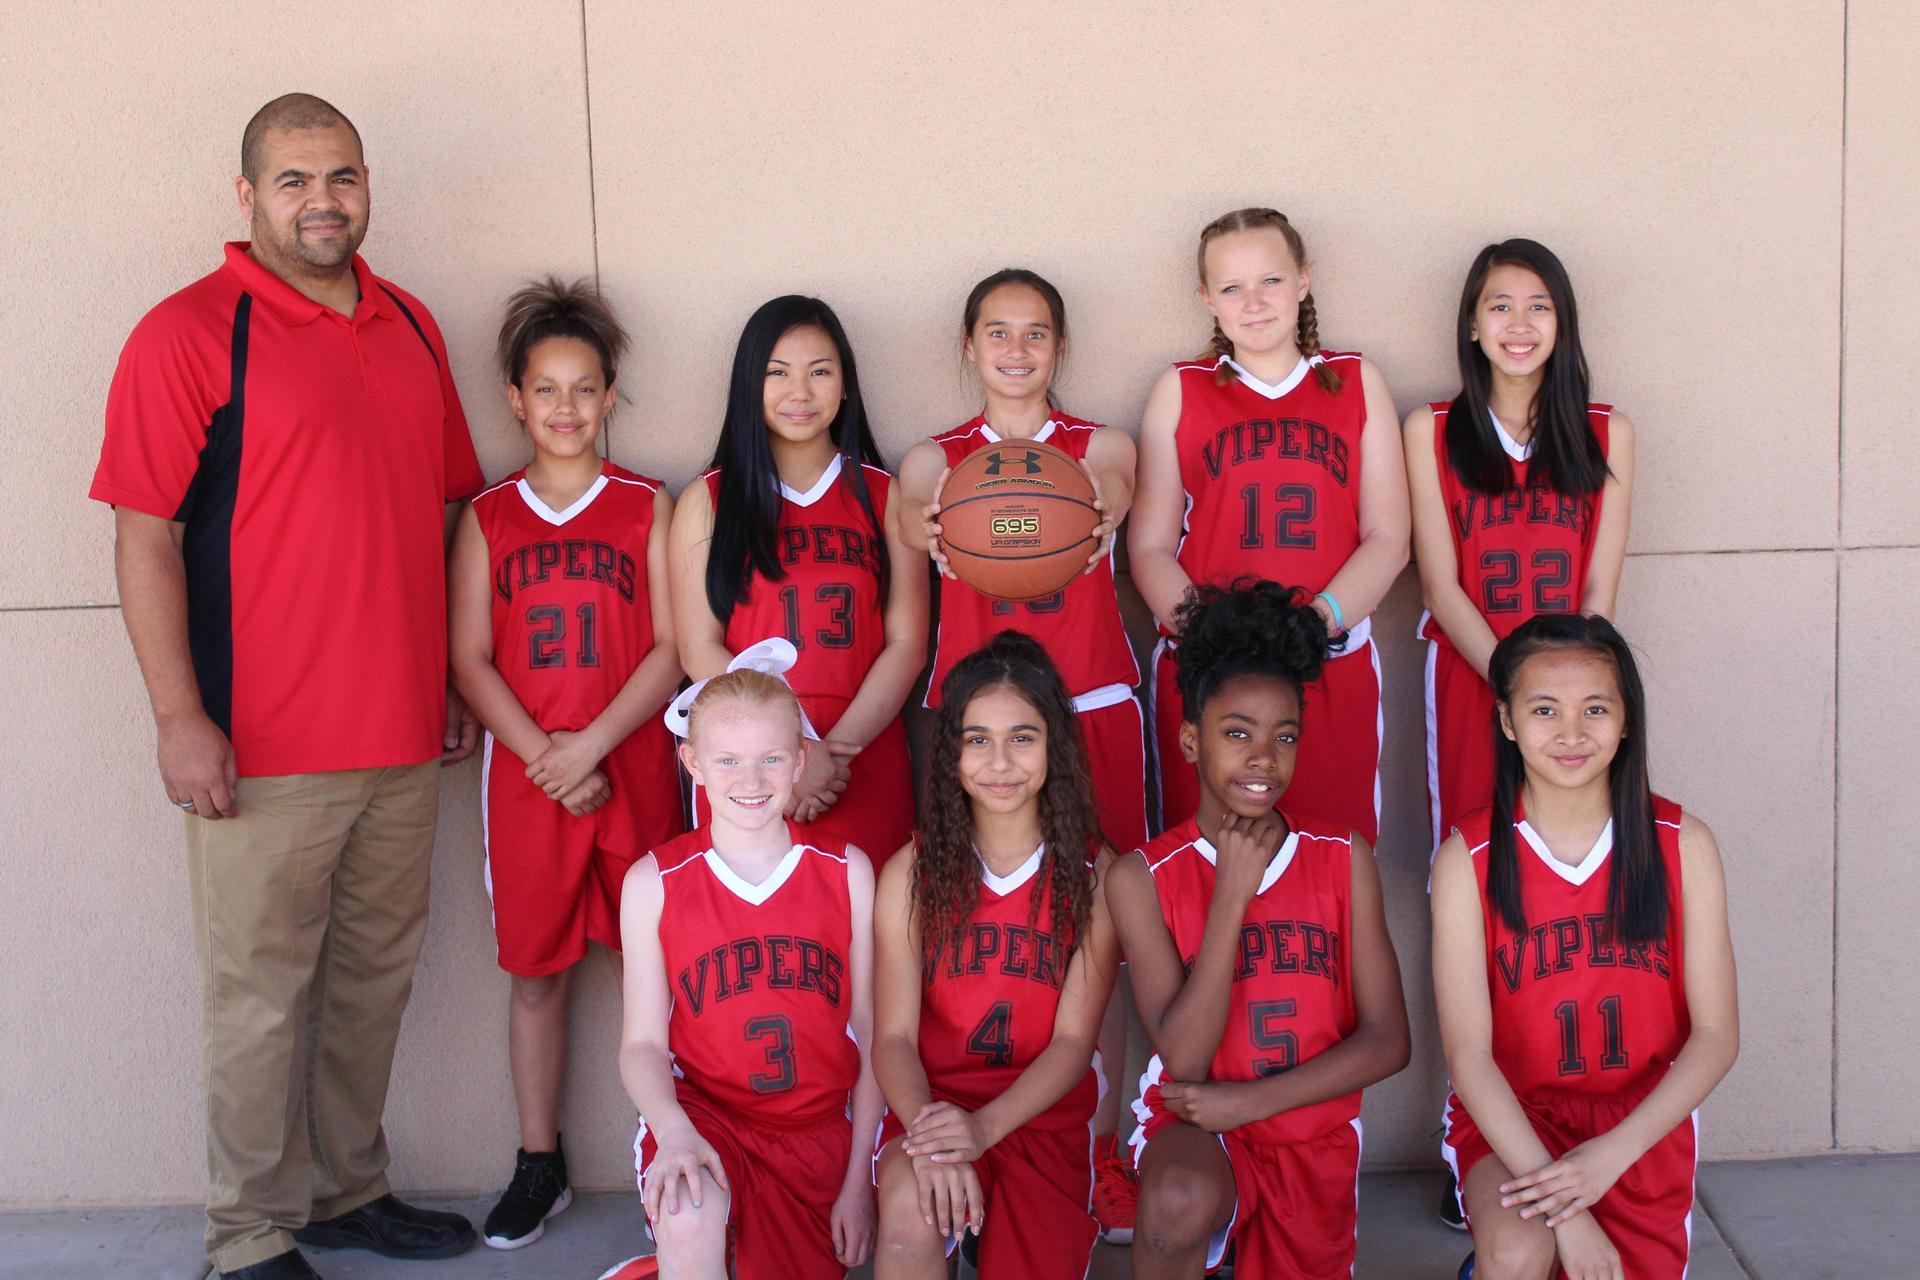 2018 Vipers Girls Basketball